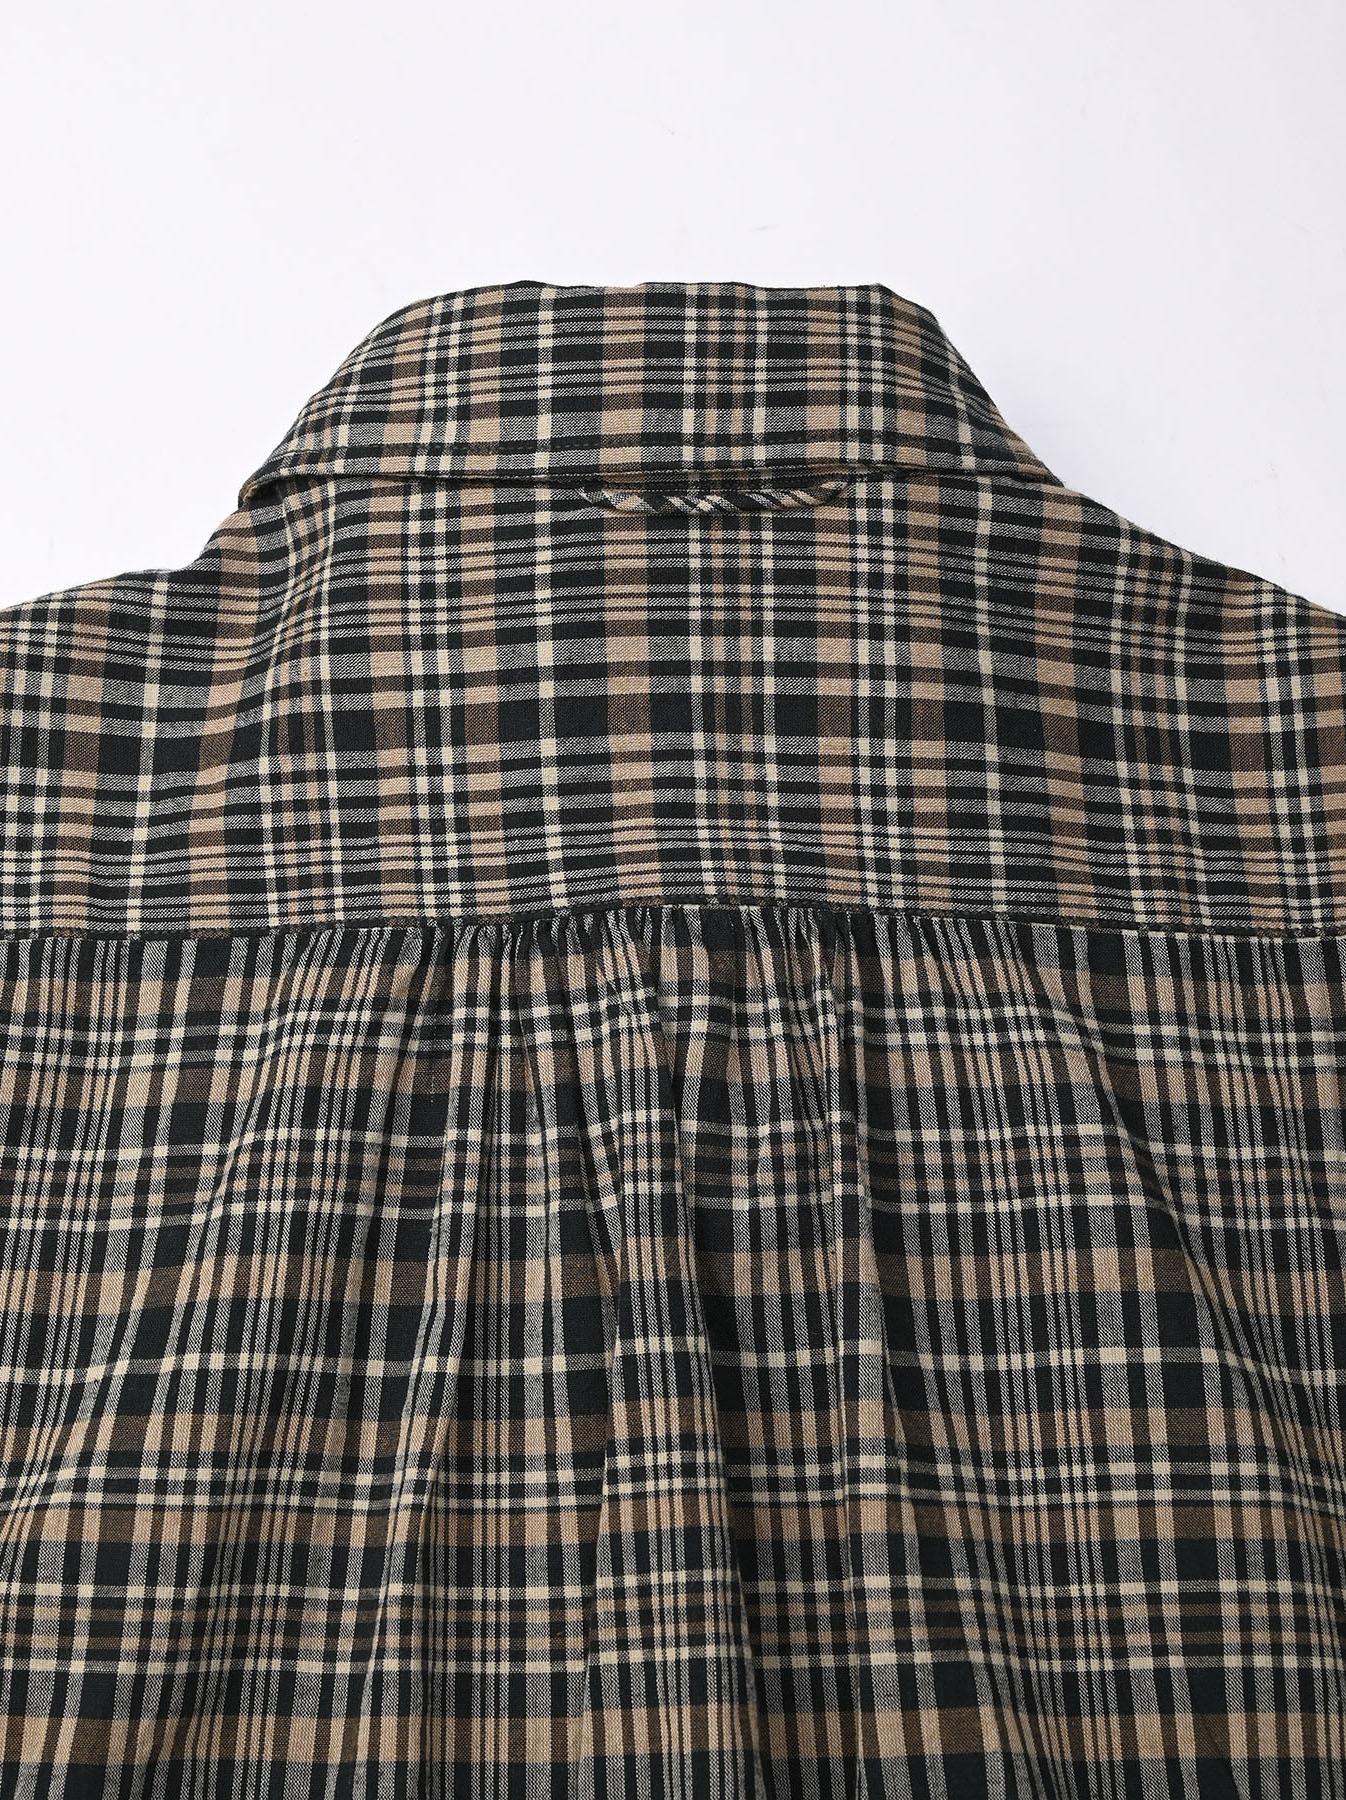 Indian Mugi-hira Dress (0421)-11